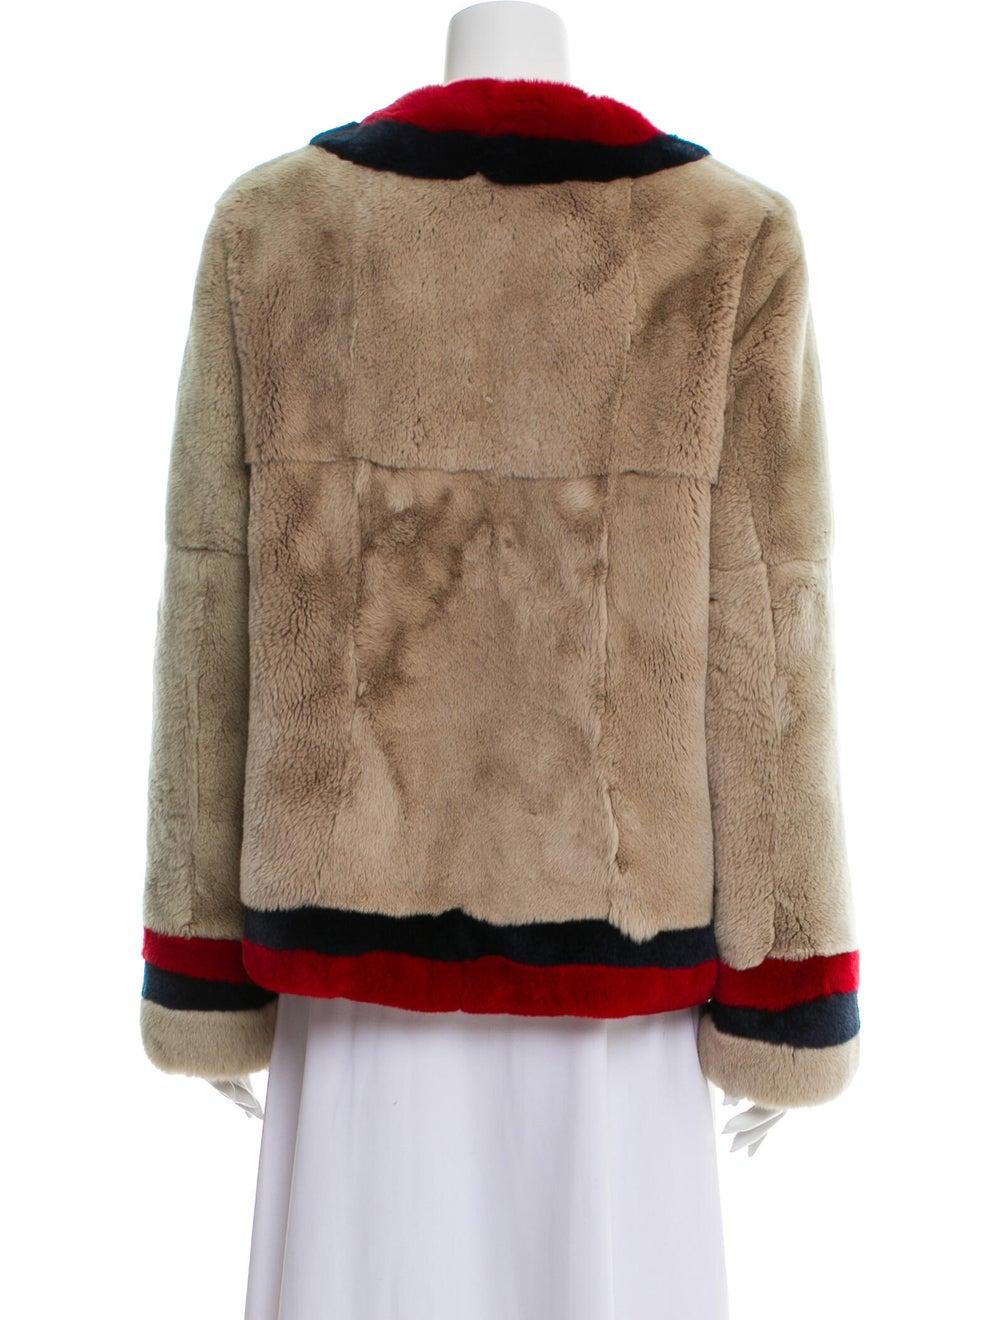 Pologeorgis Colorblock Pattern Fur Jacket - image 3